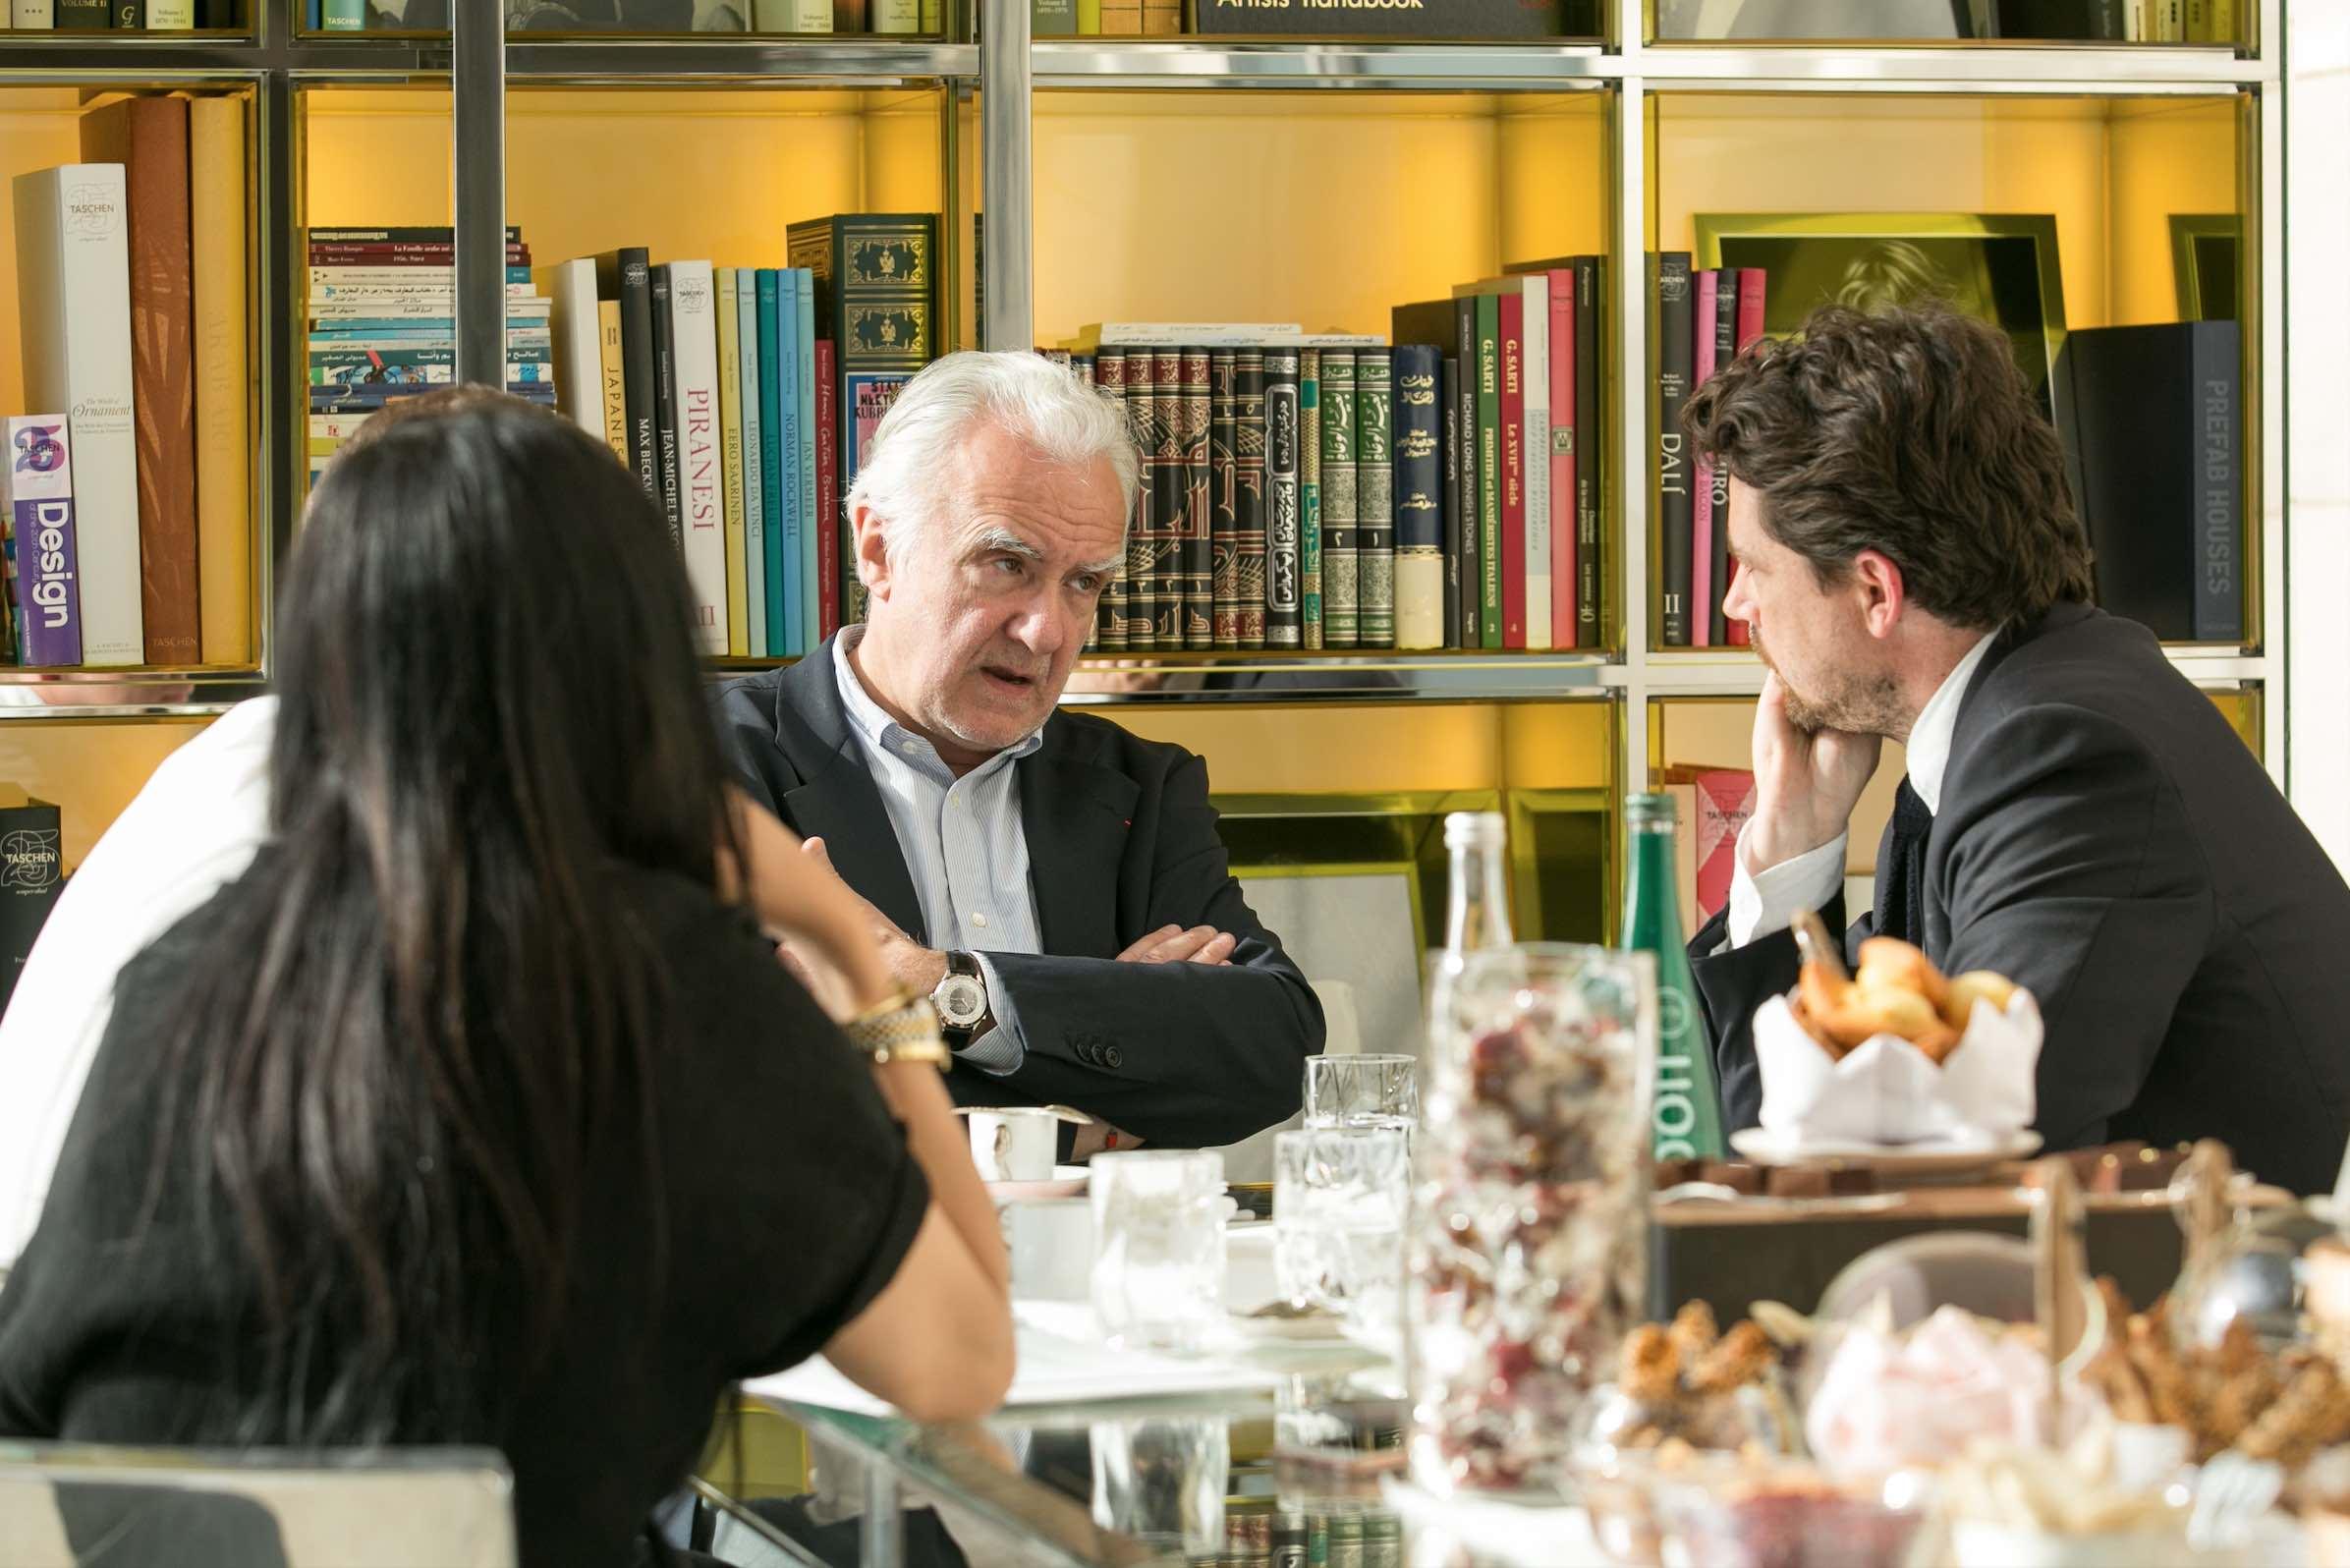 Alain Ducasse Interview